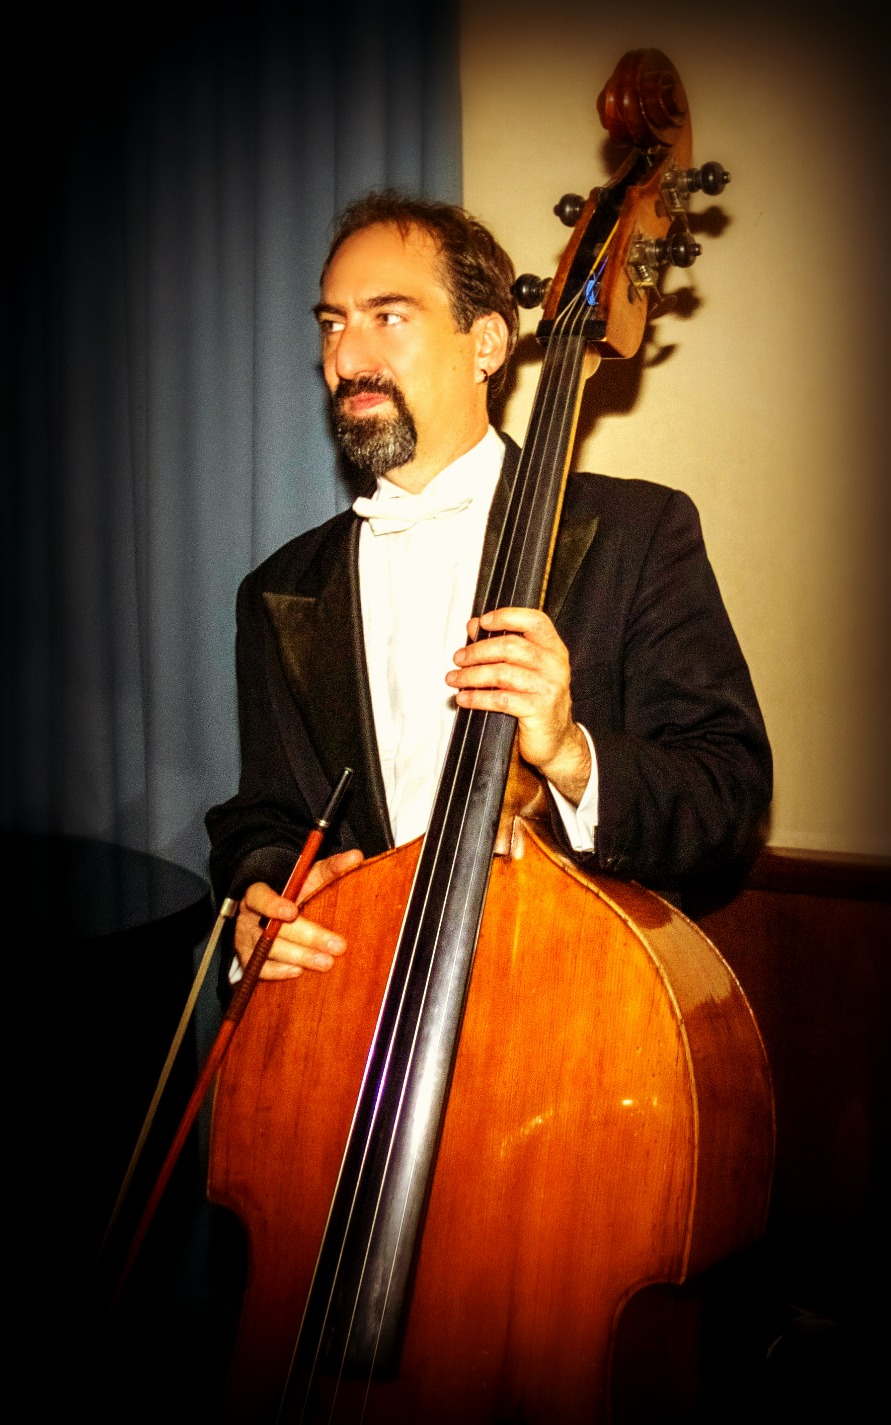 Matteo Liuzzi